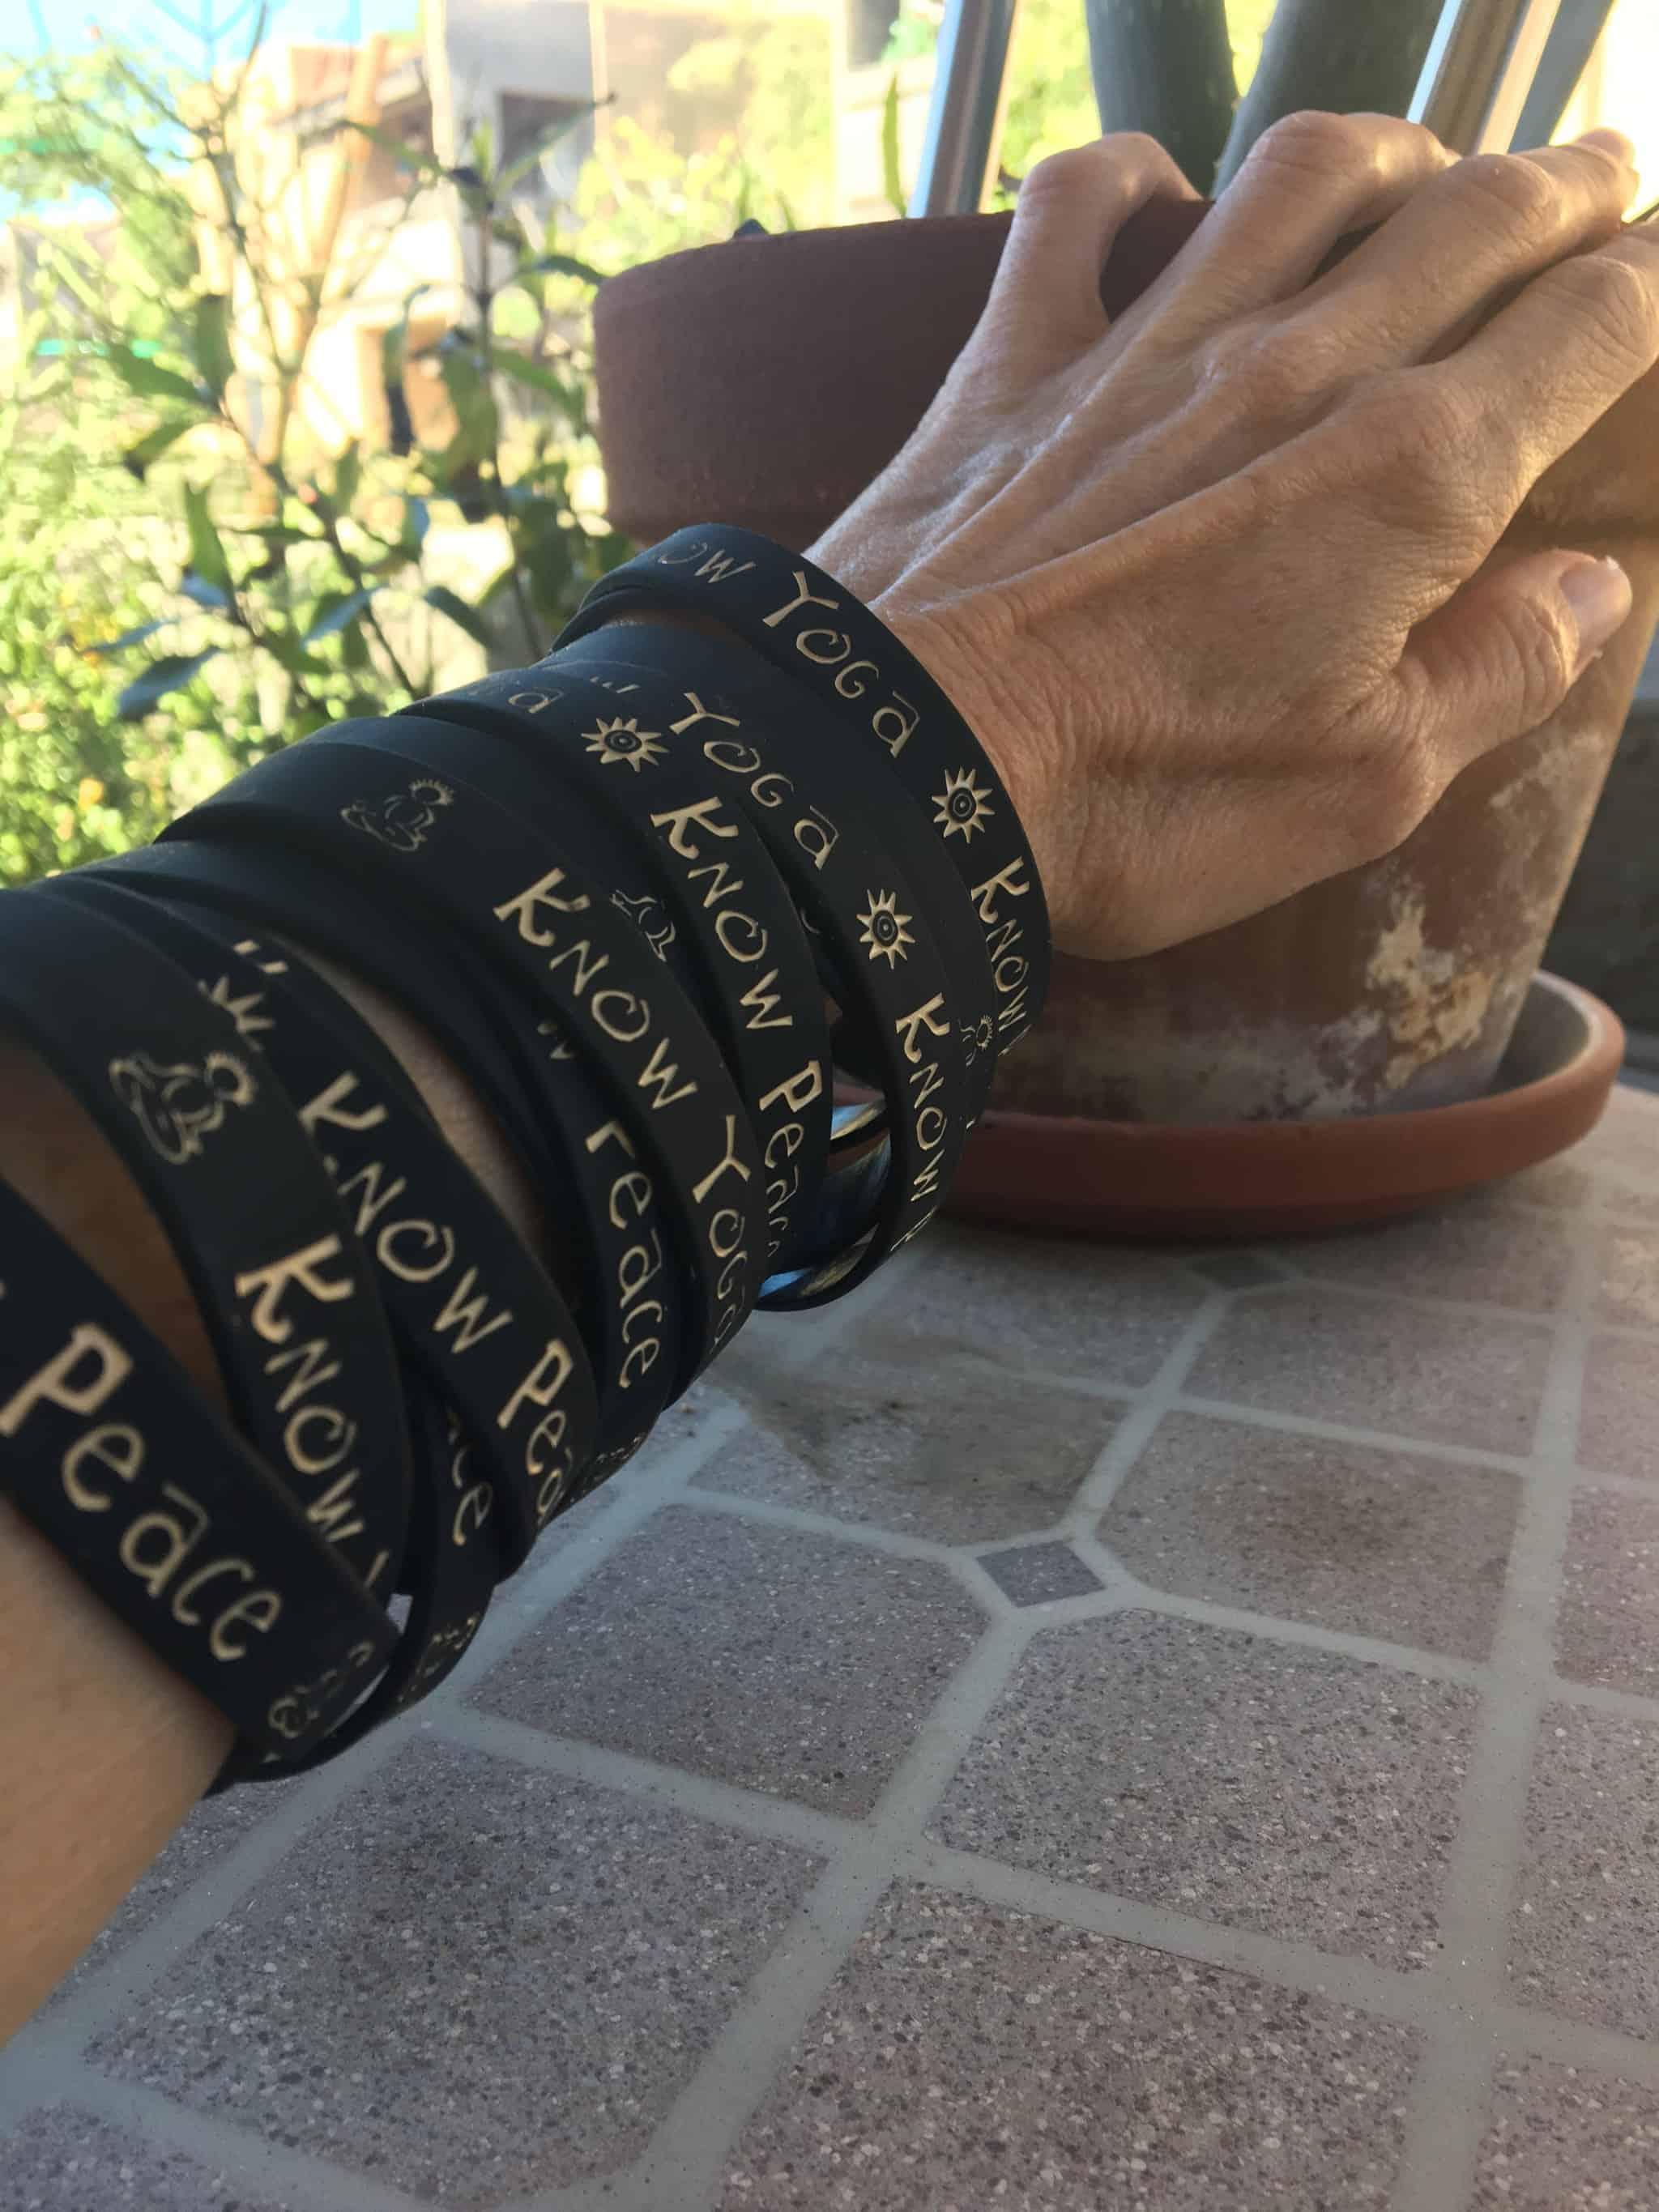 https://theyogisjourney.com/arts-jewelry/yoga-bracelet/ Only $4.99 & F R E E ShippingIMG_6082